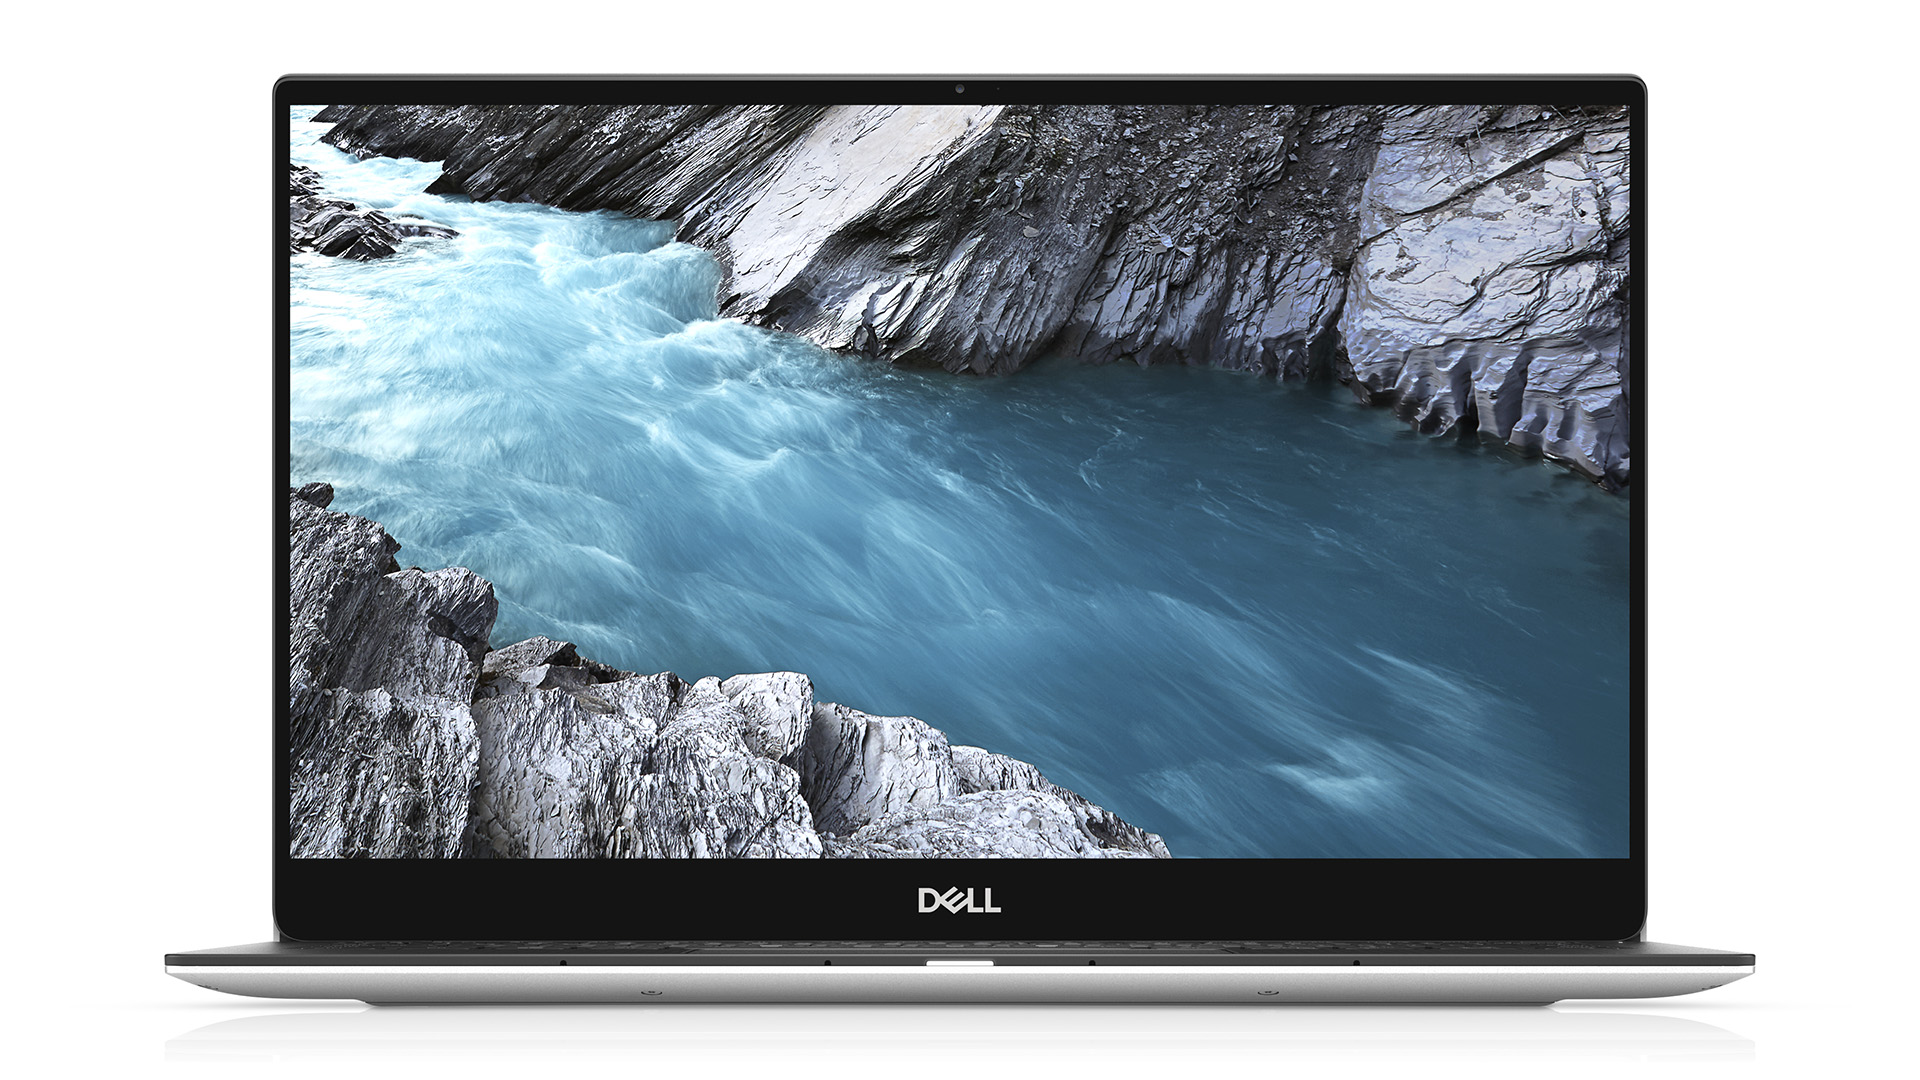 Dell и Alienware на CES 2019: гайд по всем основным новинкам